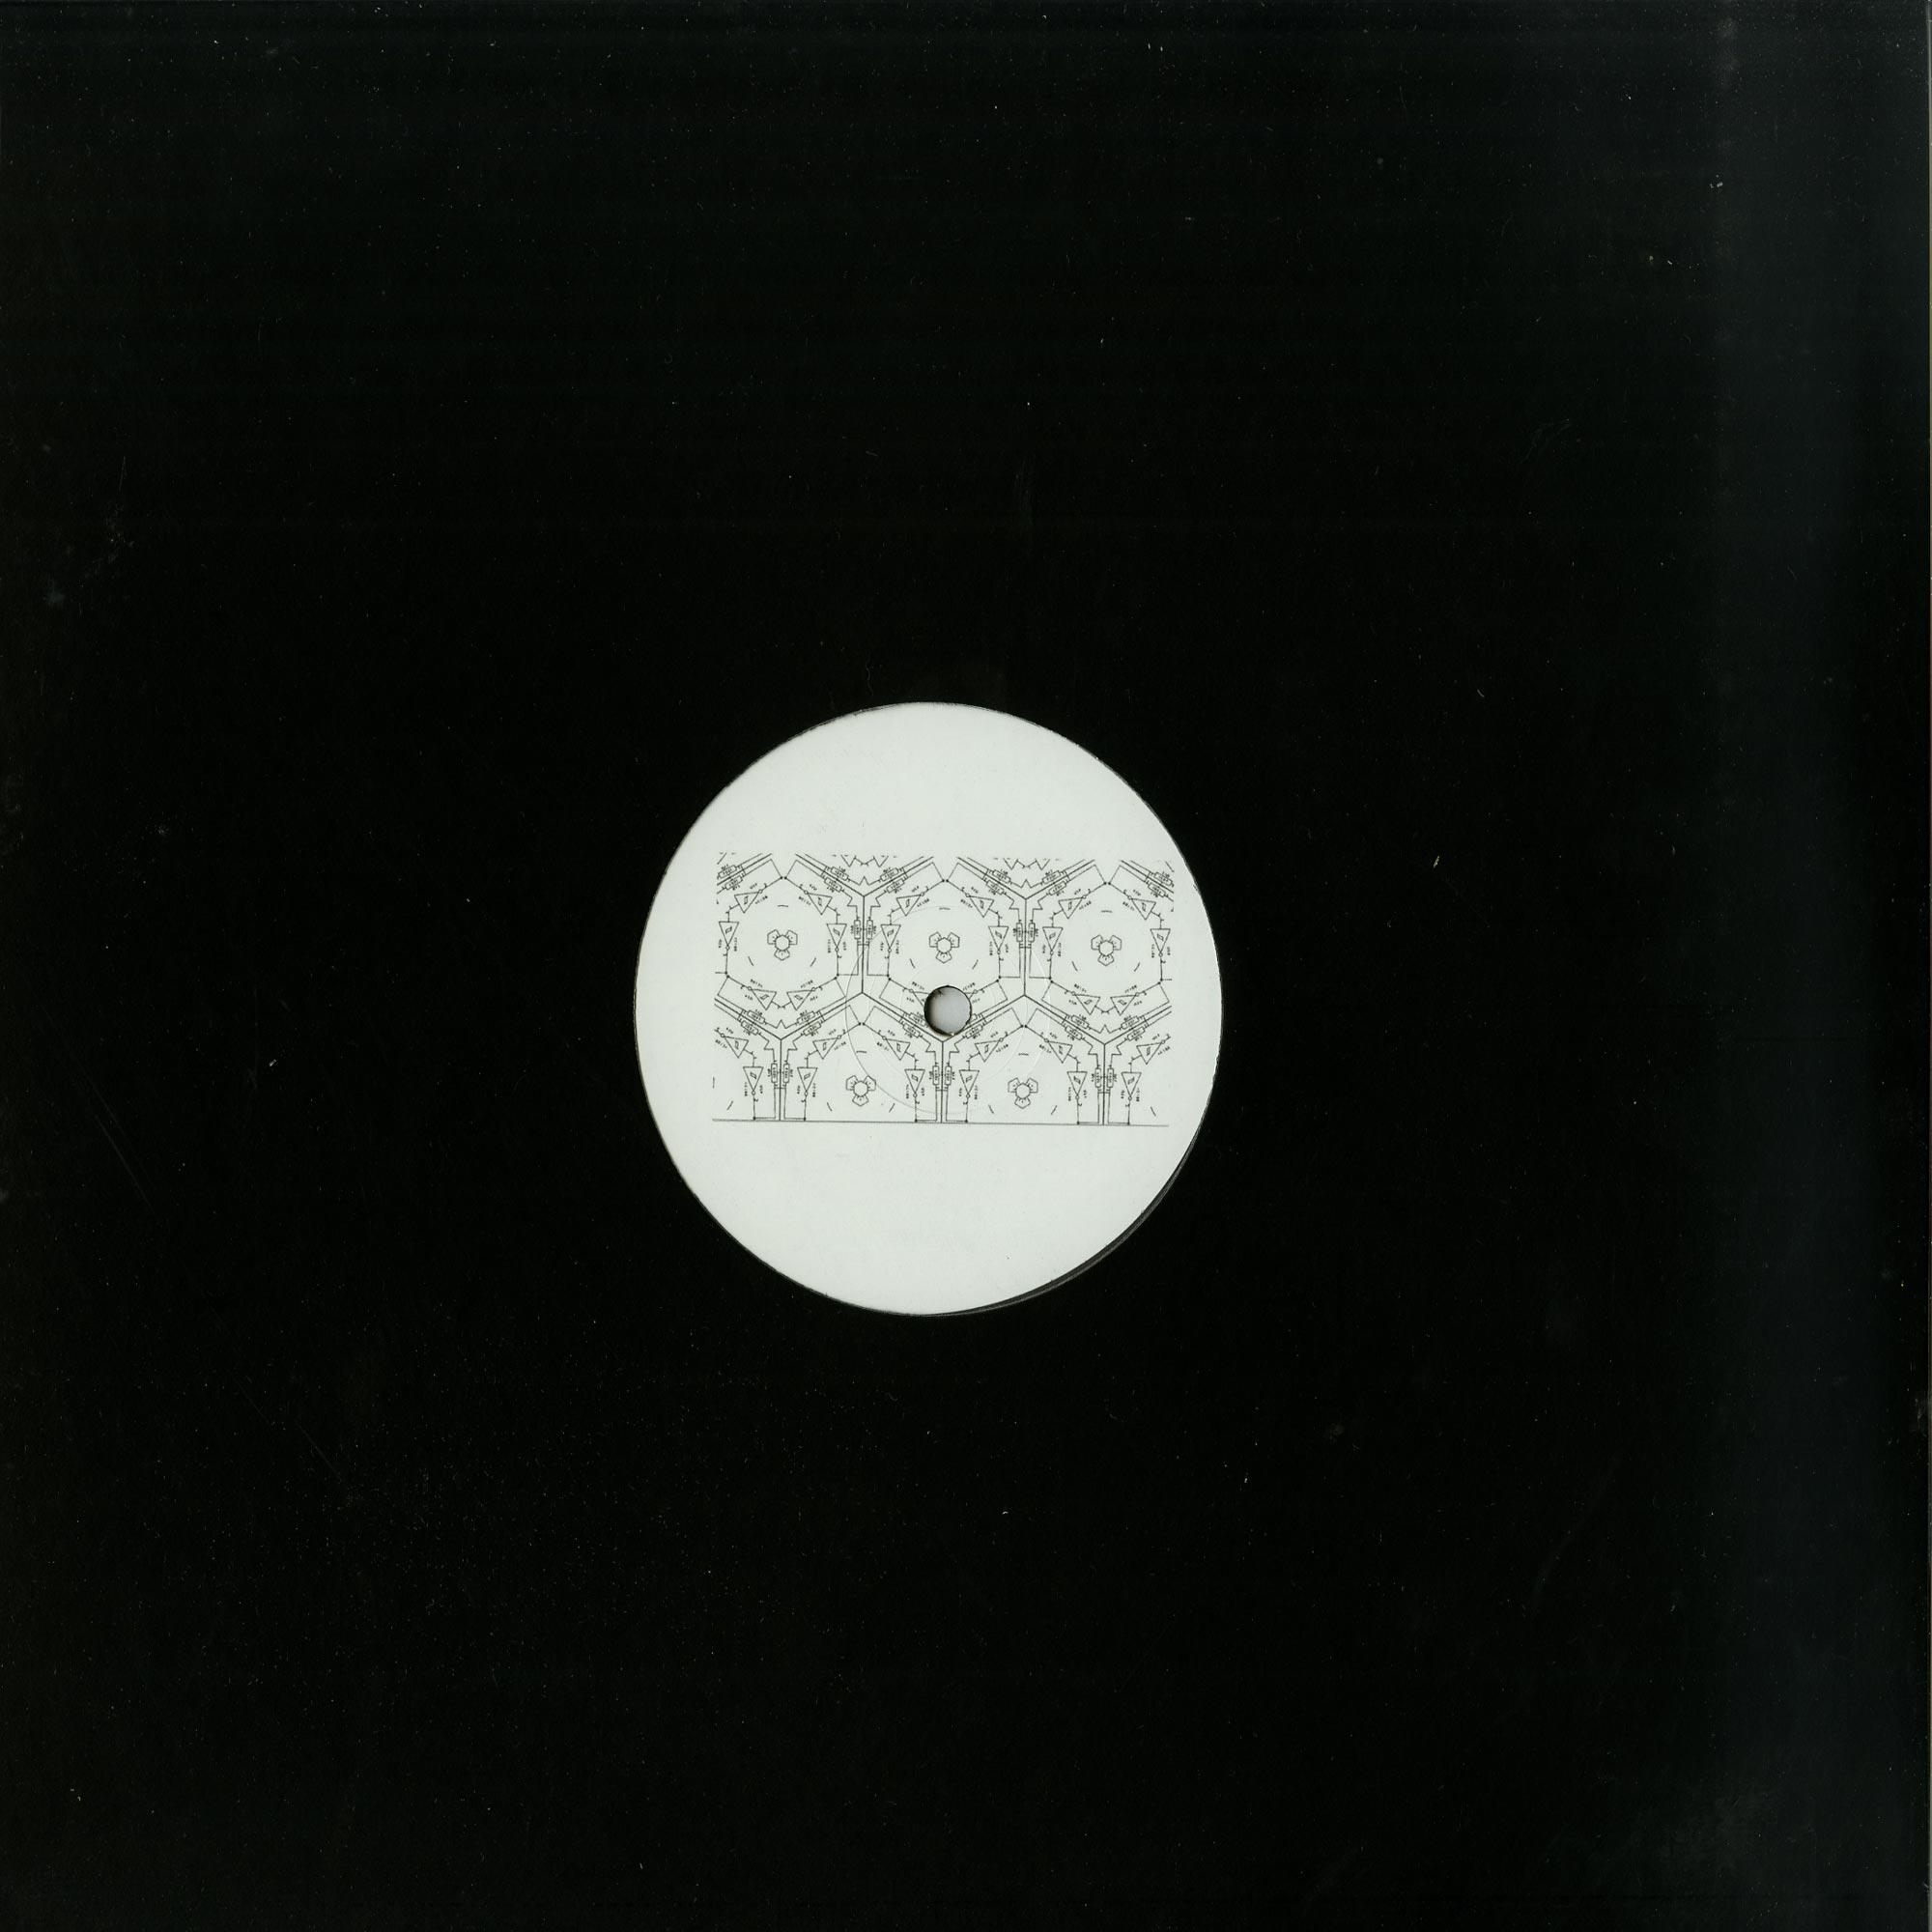 R.ess 048 - CRG77